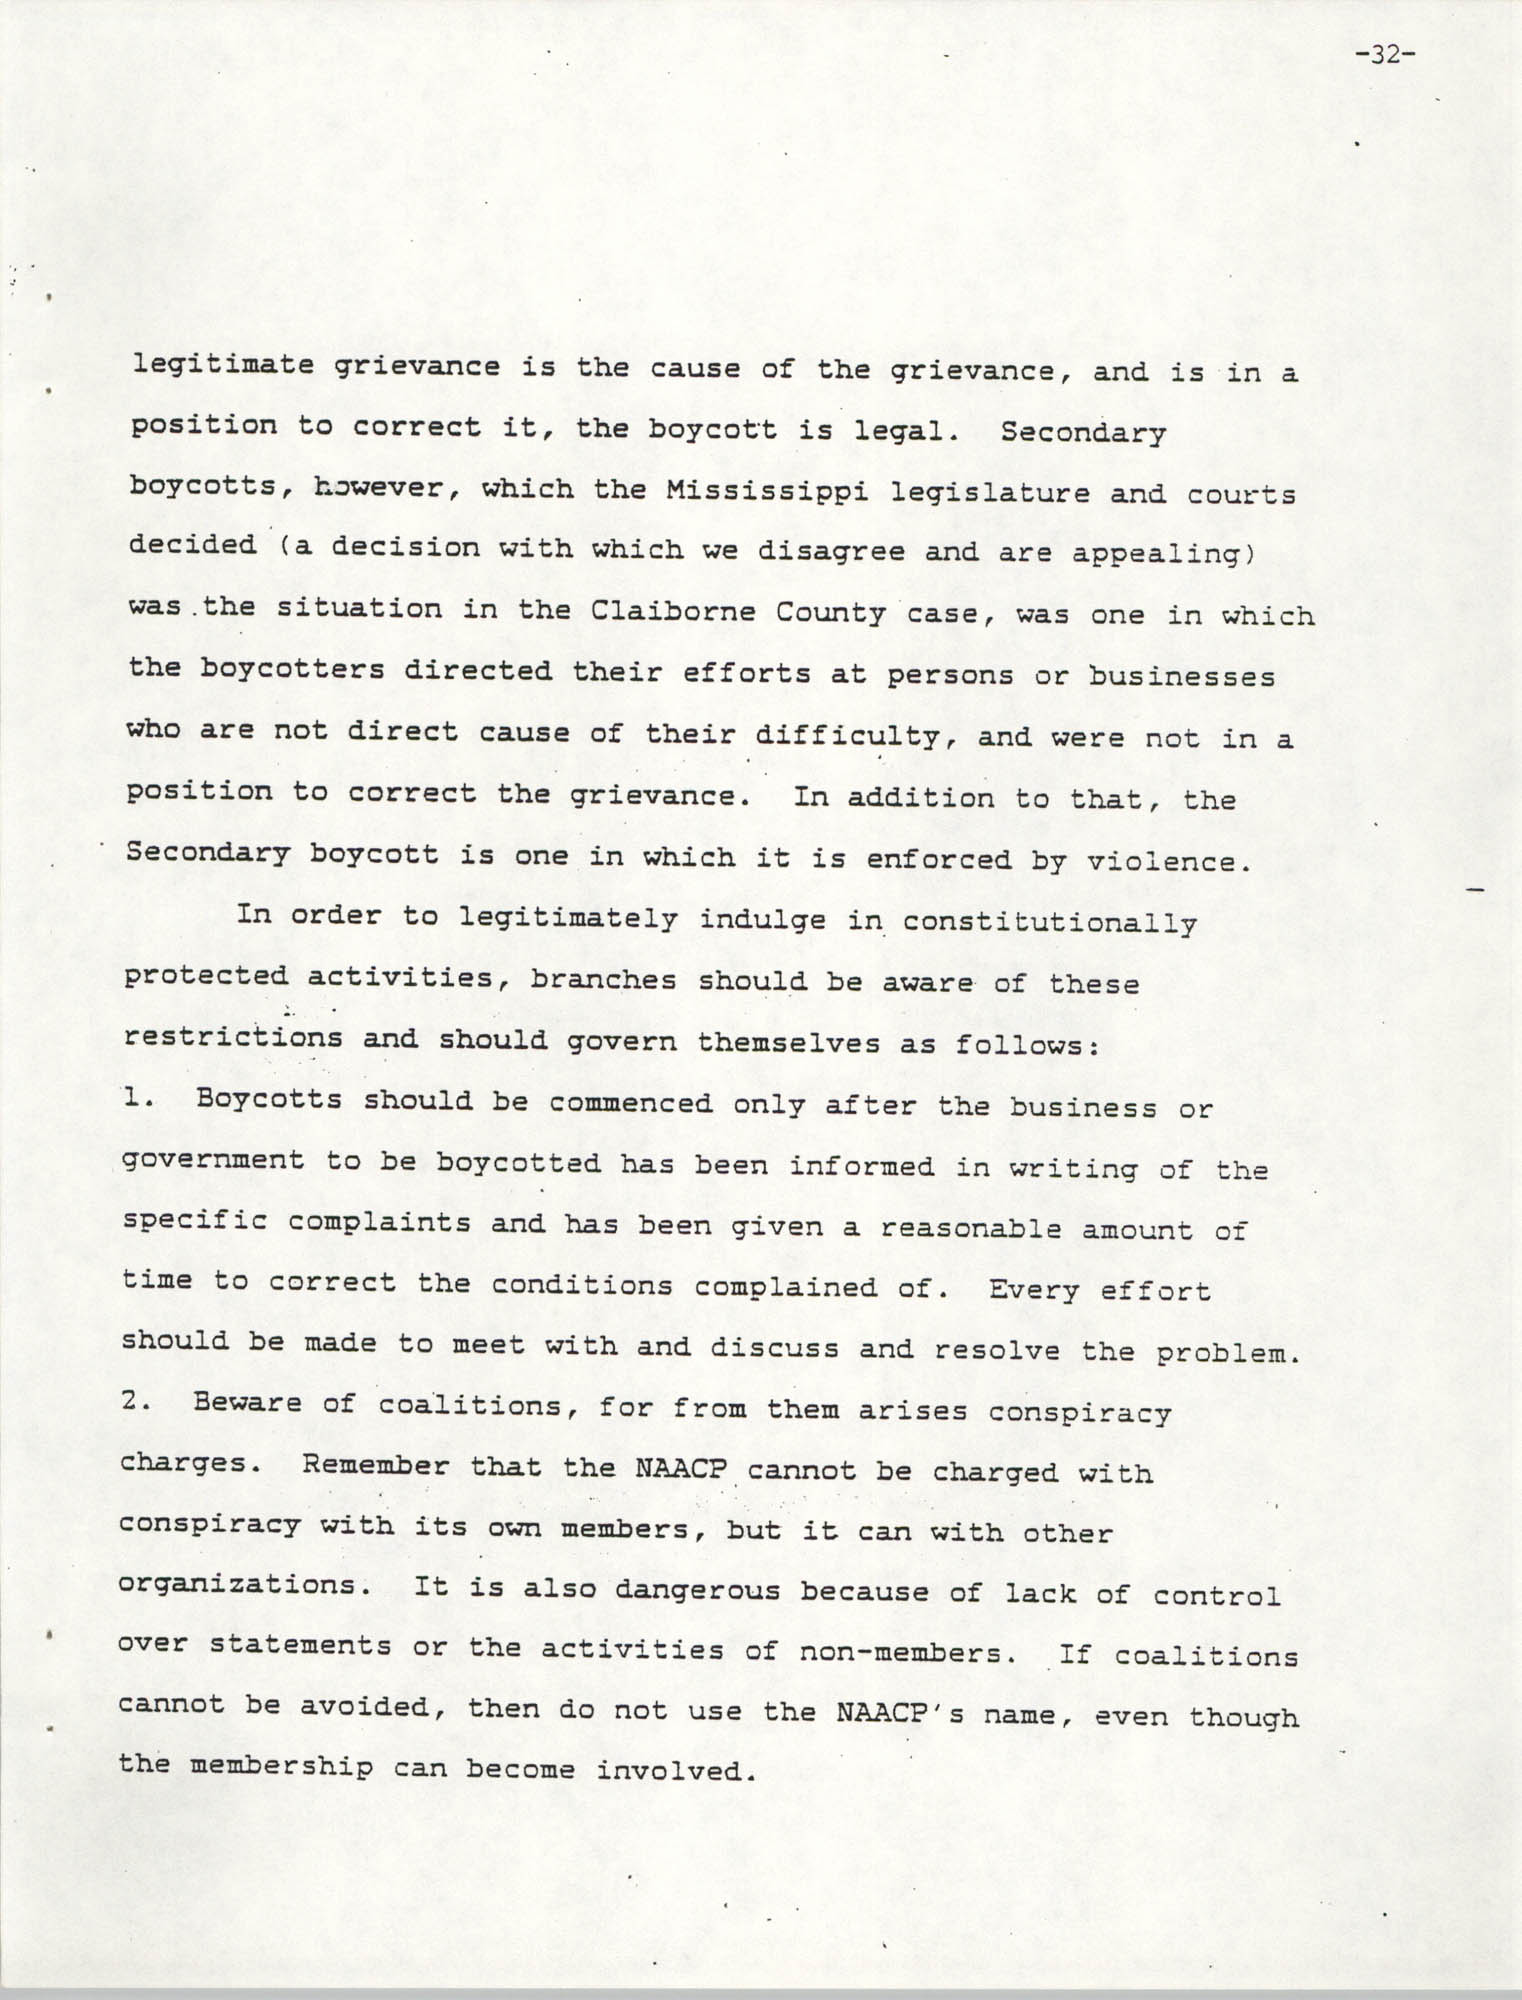 NAACP Mandatory Training Handbook, 1989, Page 32